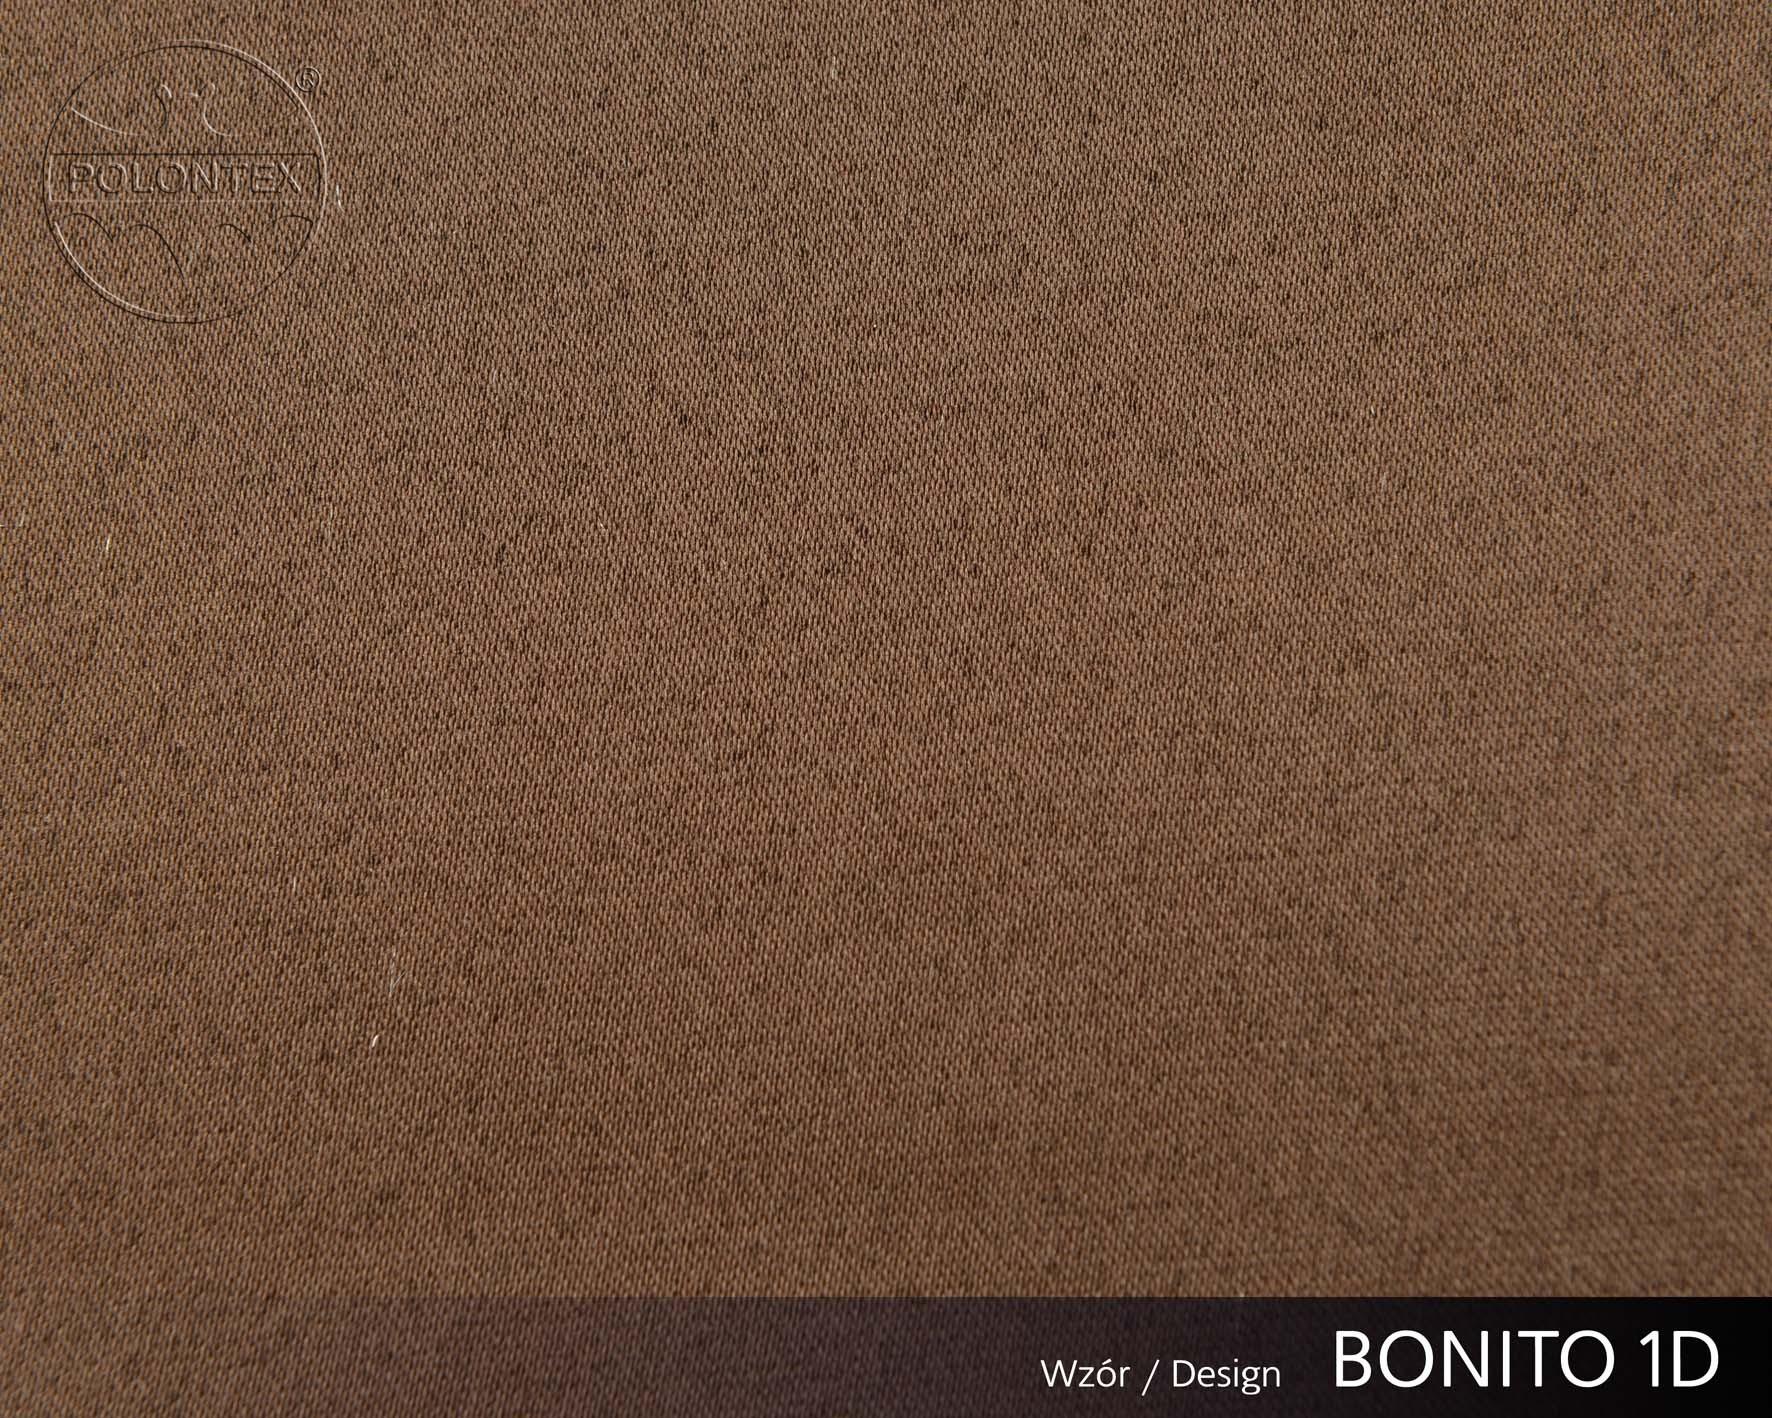 Bonito 1D 7508